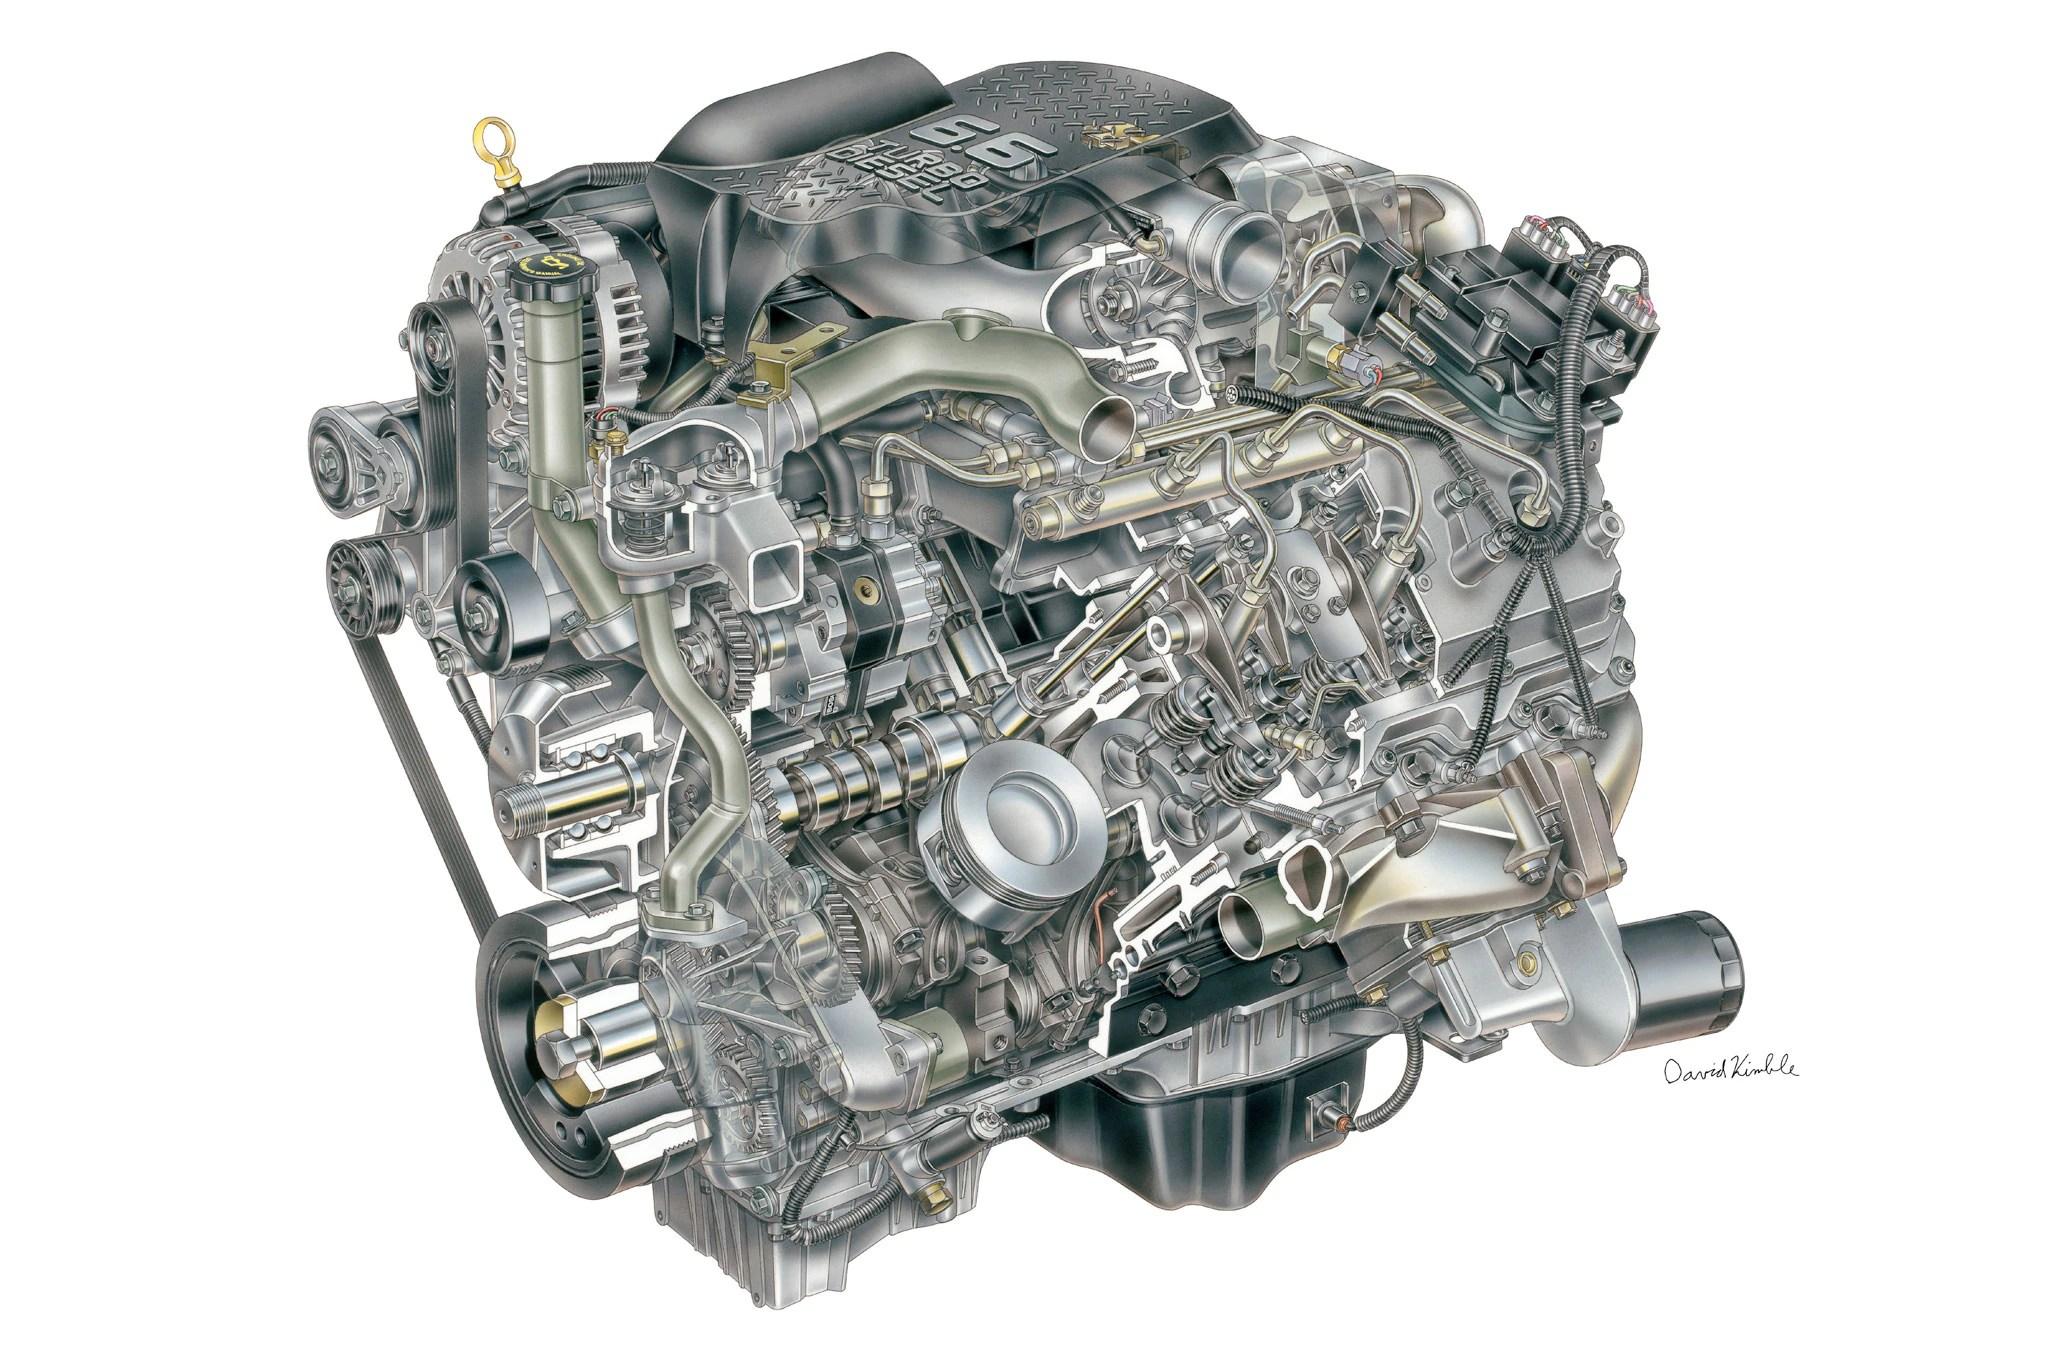 hight resolution of engine diagram 05 6 6 duramax